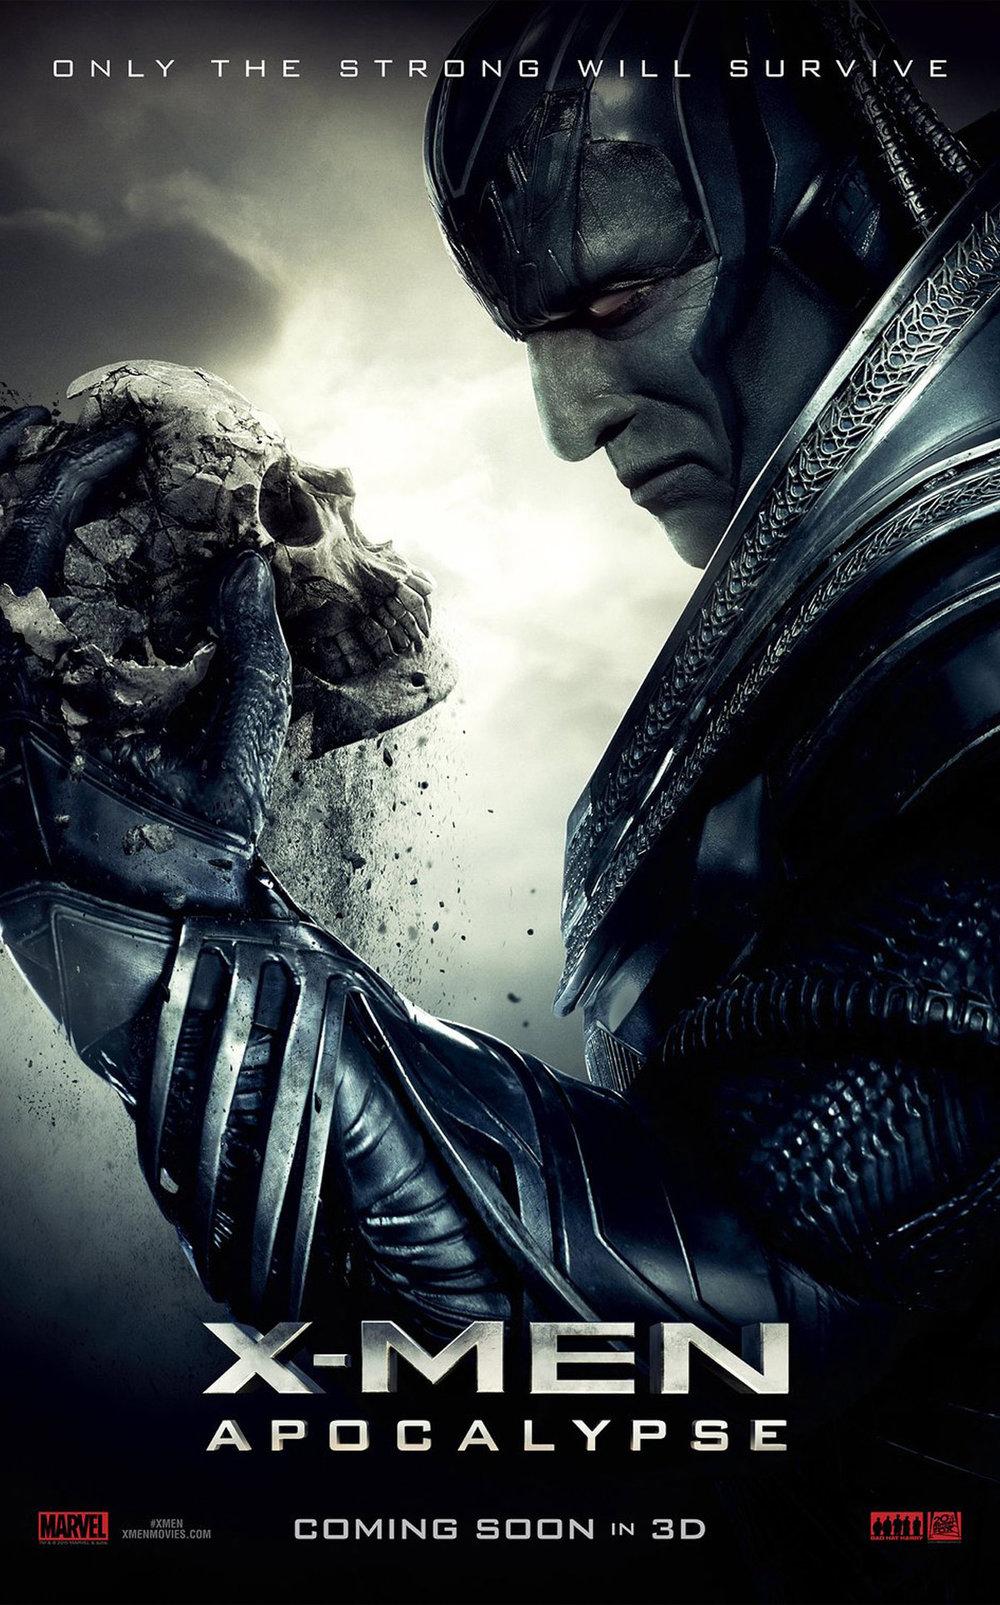 X-Men_Apocalypse-Poster.jpg